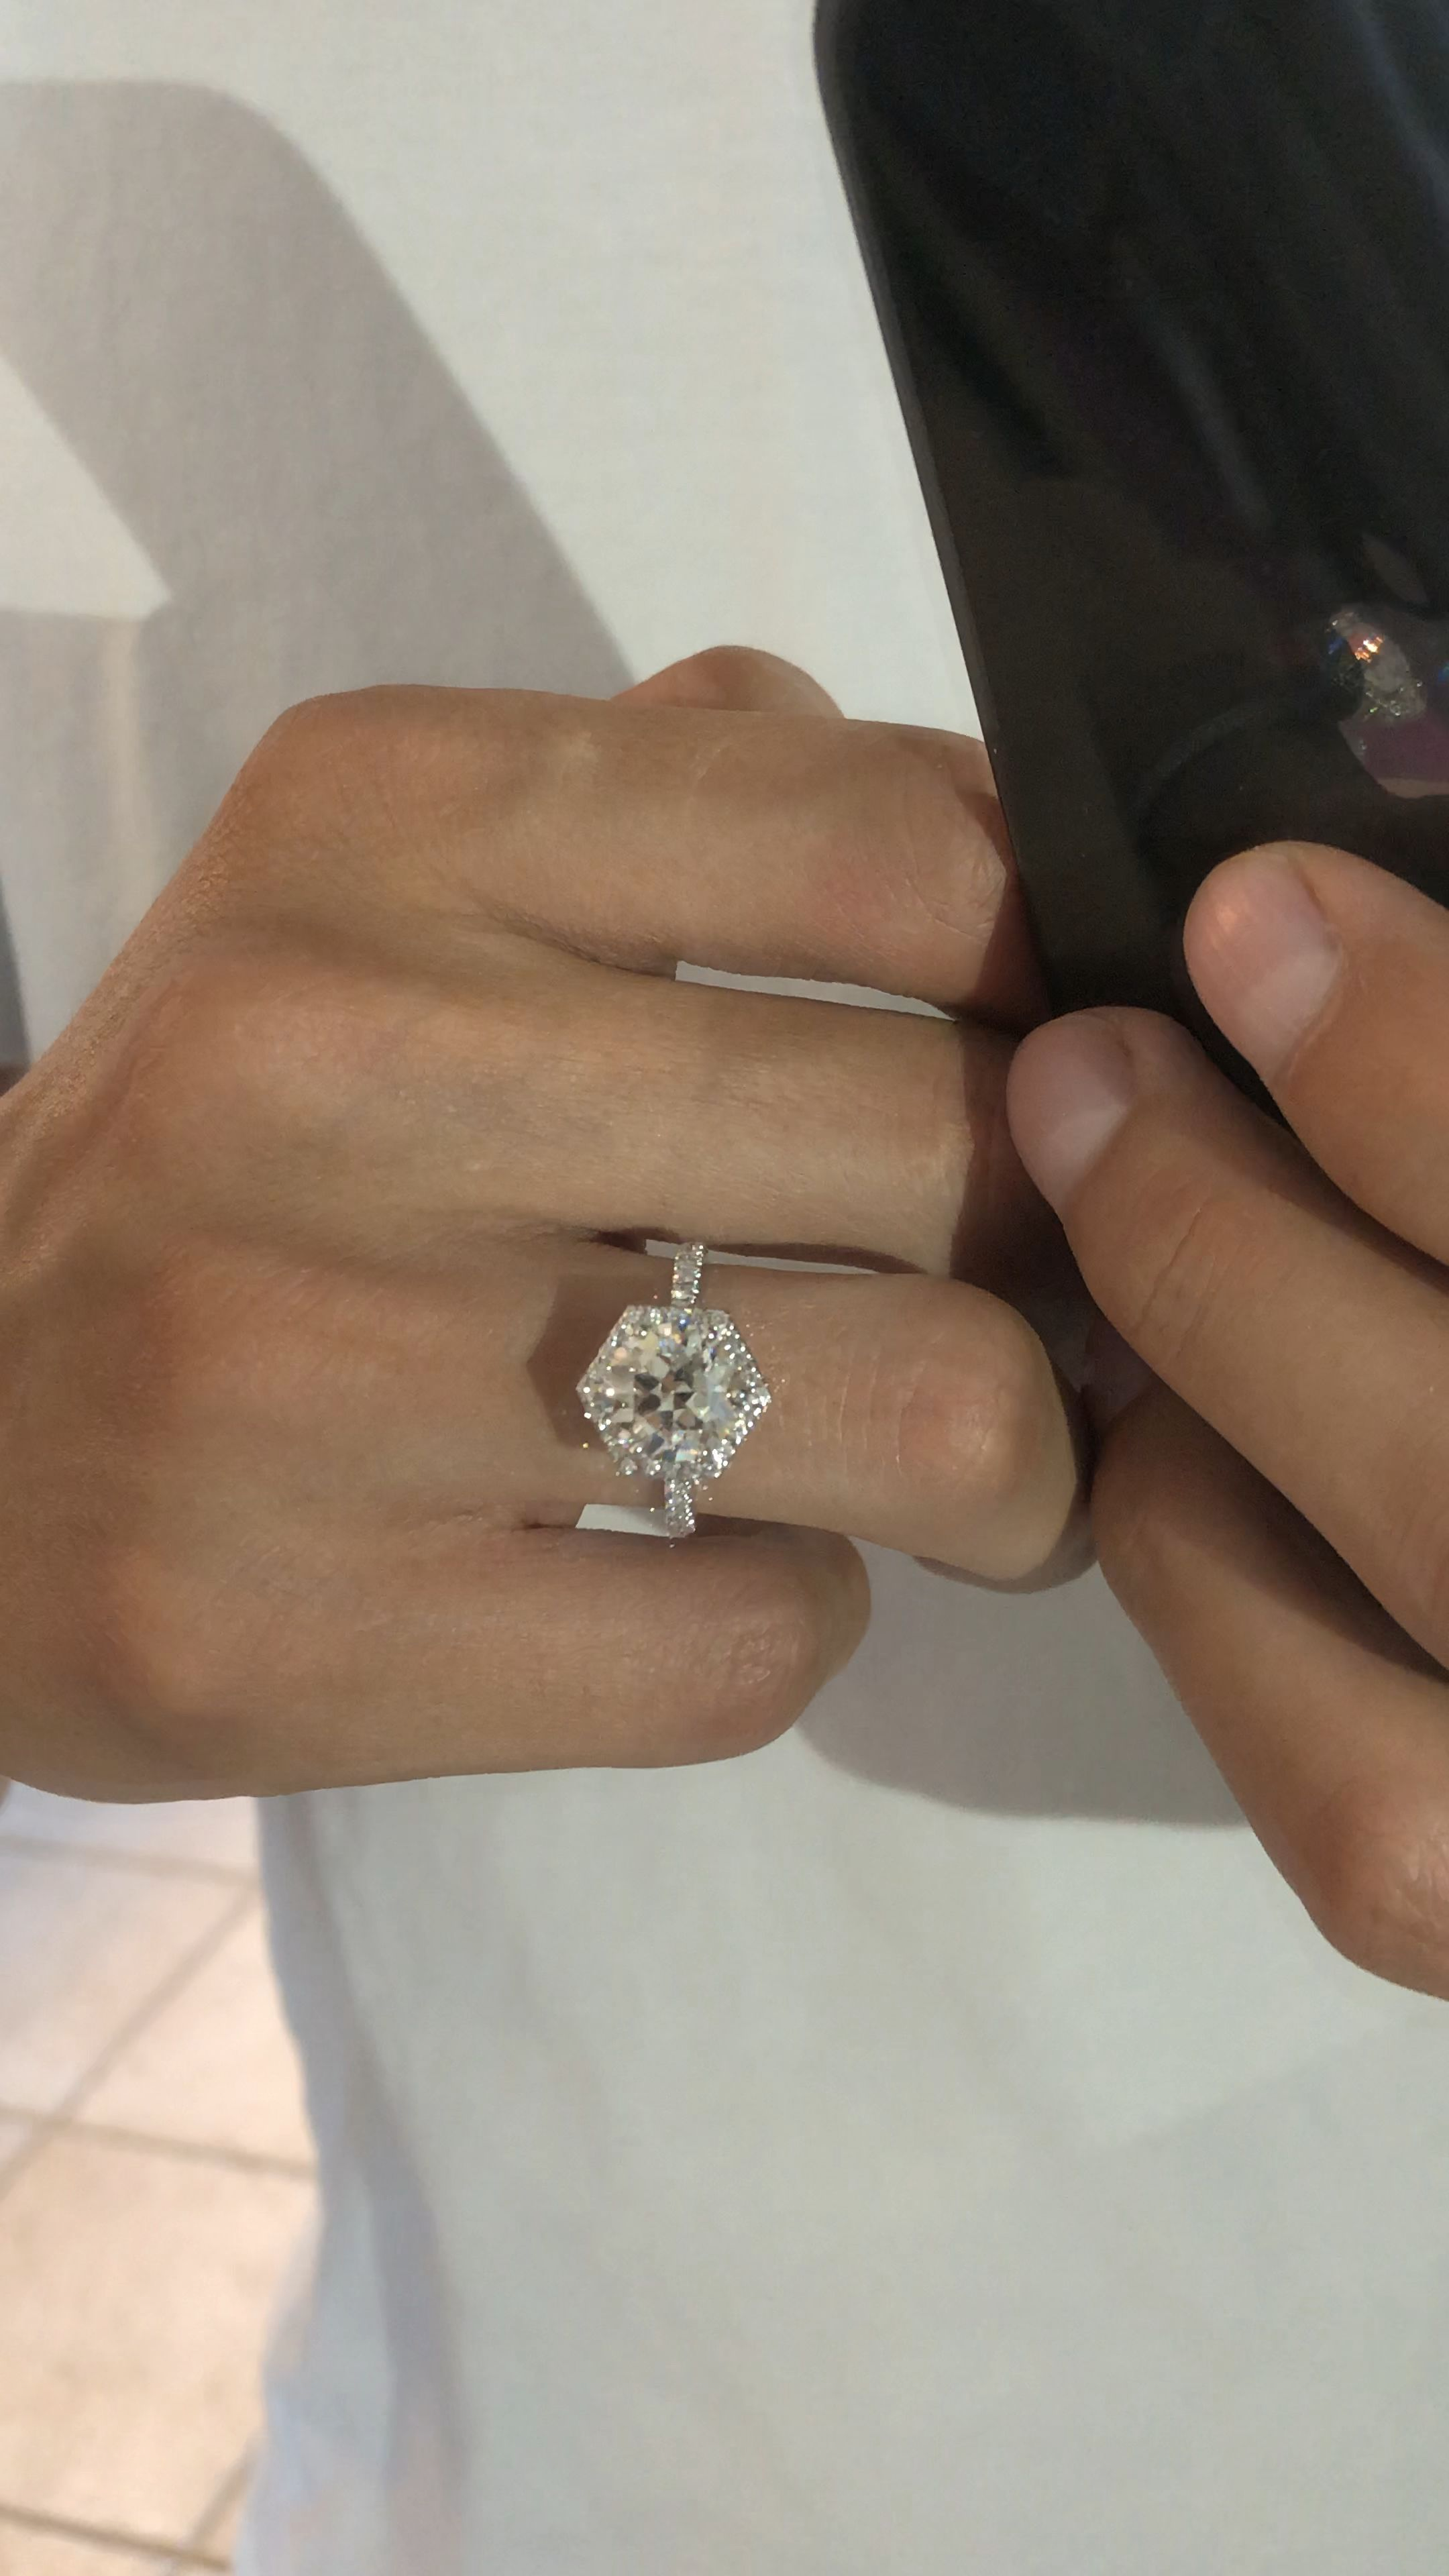 Raven Fine Jewelers Oec Diamond Rings Halo Rings Vintage Meets Modern Anniversa Engagement Ring White Gold Vintage Engagement Rings Womens Engagement Rings